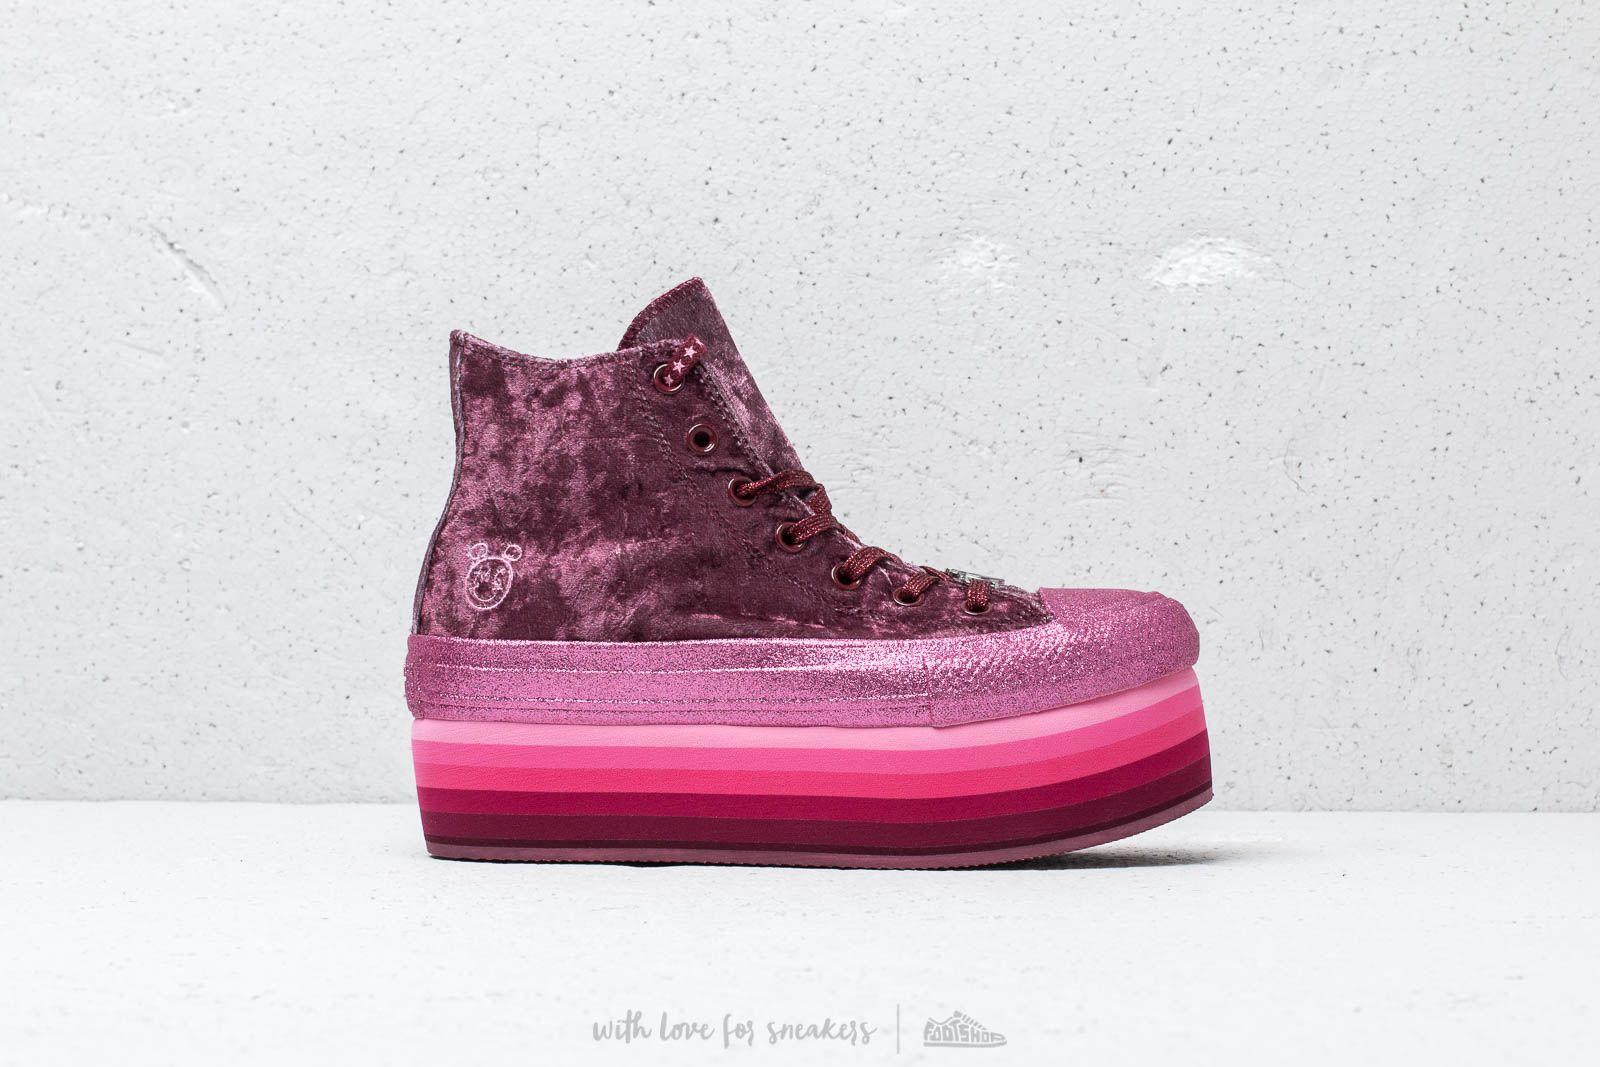 81dcdfd29b9 Converse x Miley Cyrus Chuck Taylor All Star Platform Hi Dark ...